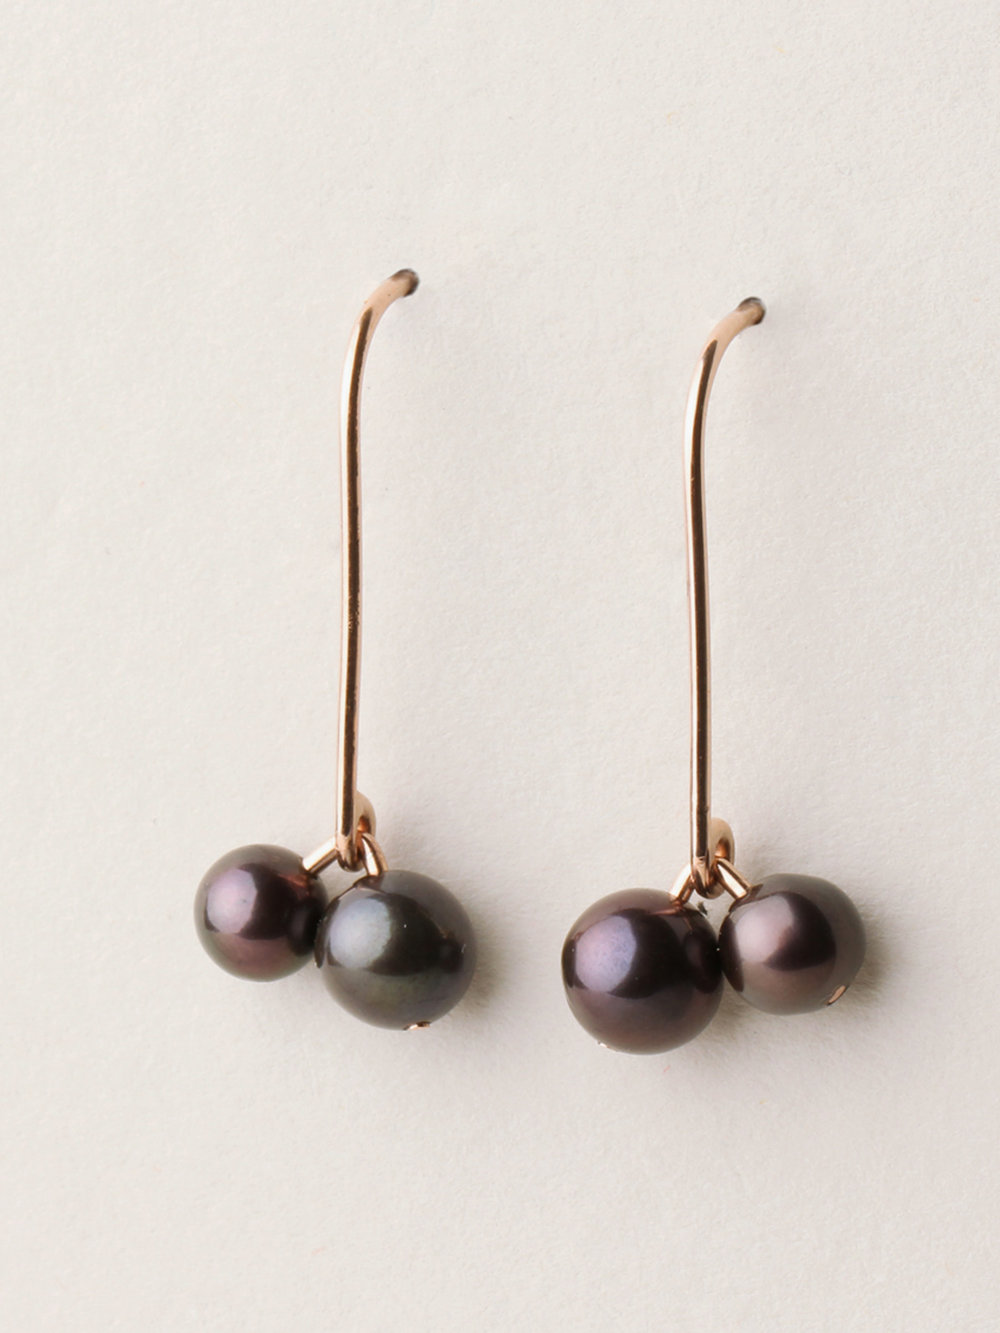 Perlen Ohrhänger, lang mit 2 Perlen in 585 Rosegold und echten Süßwasserzuchtperlen/ Pearl earrings, long with 2 pearls in 14kt Rosegold and sweetwater pearls